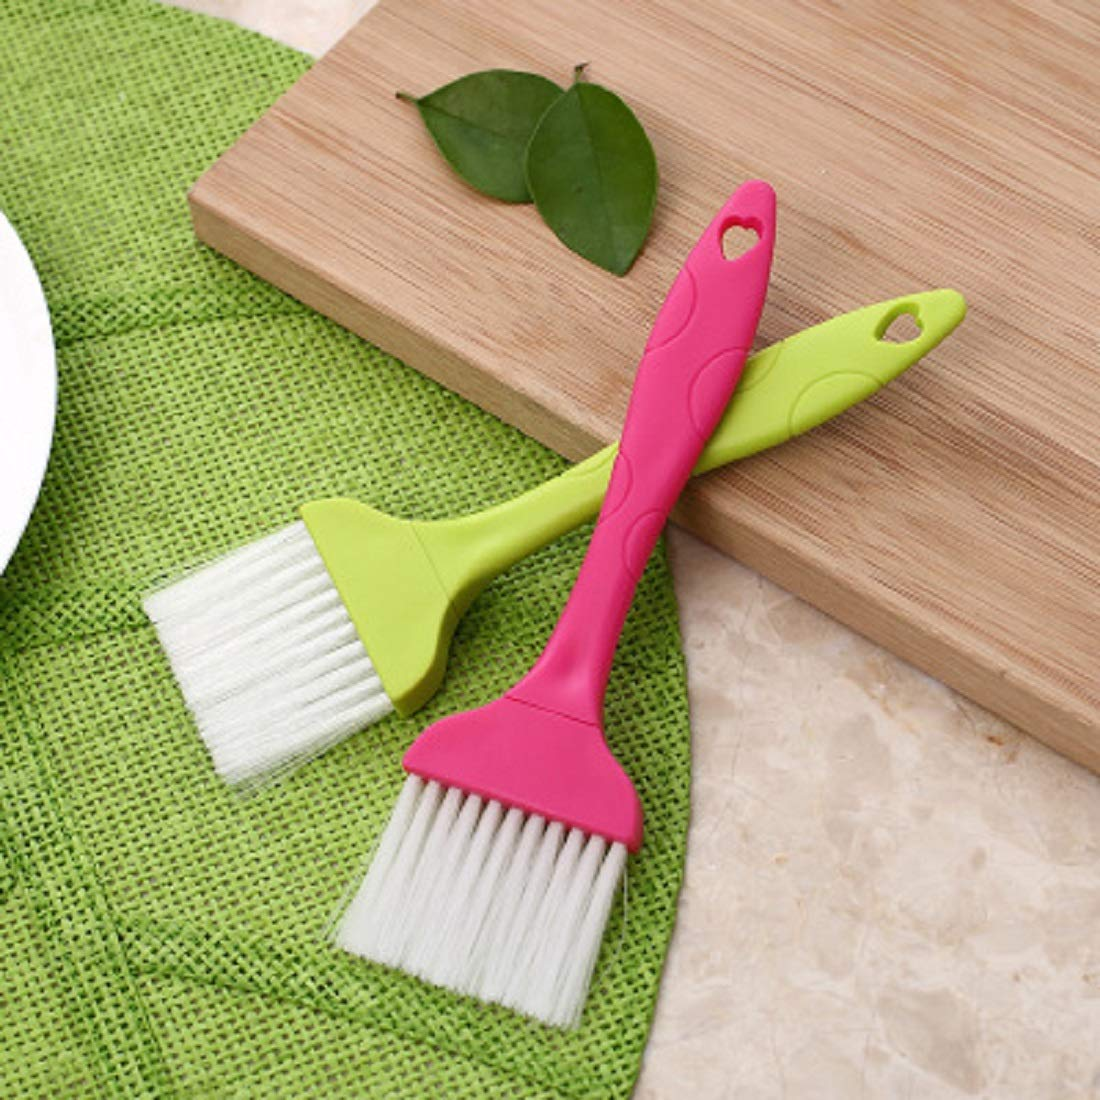 Nylon Bristle Pastry Brush Plastic Grip for Basting, Baking, Cooking Food Brush, Green, Pink